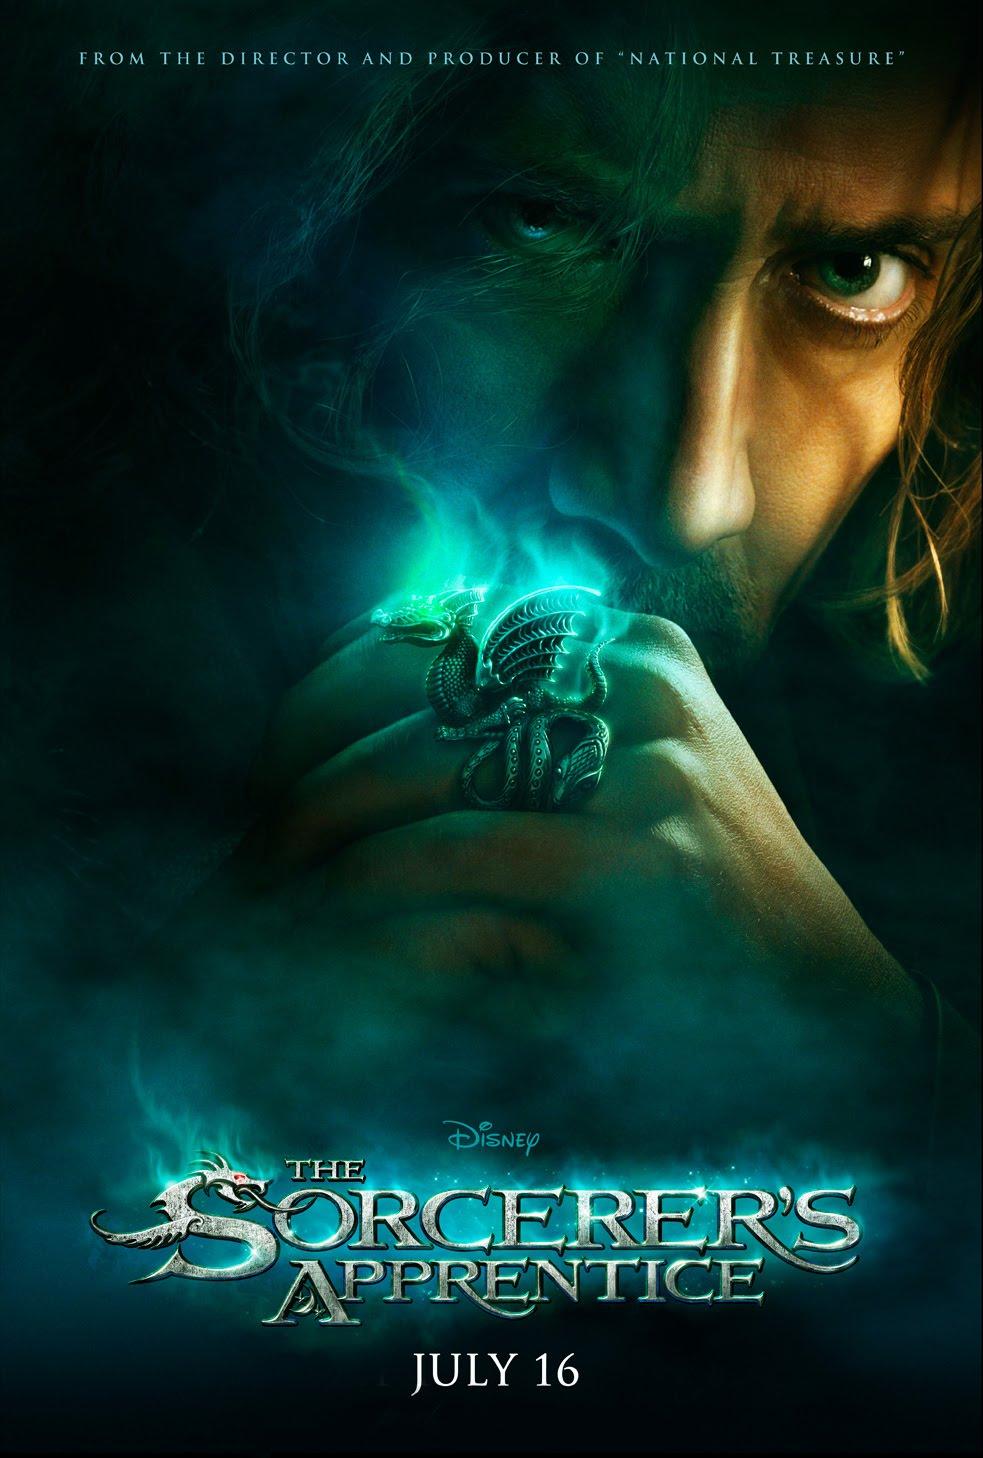 Cinema Freaks  NIC CAGE MONTH  The Sorcerer s Apprentice (2010) 7d98f9f00f06